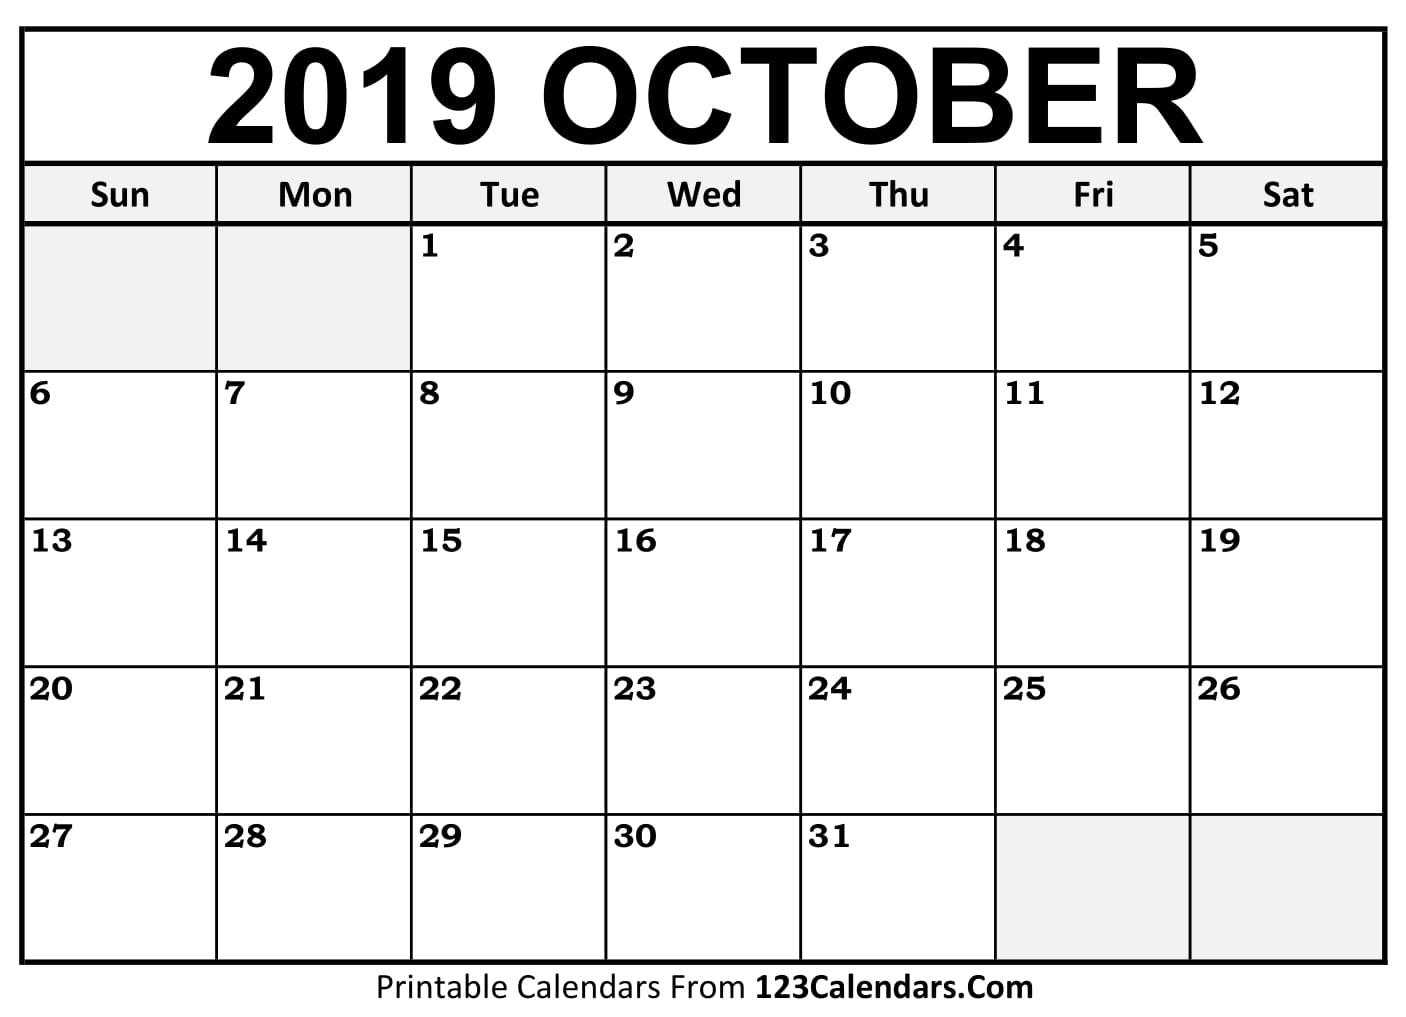 October 2019 Printable Calendar | 123Calendars inside Editable October 2019 Calendar With Religious Holidays